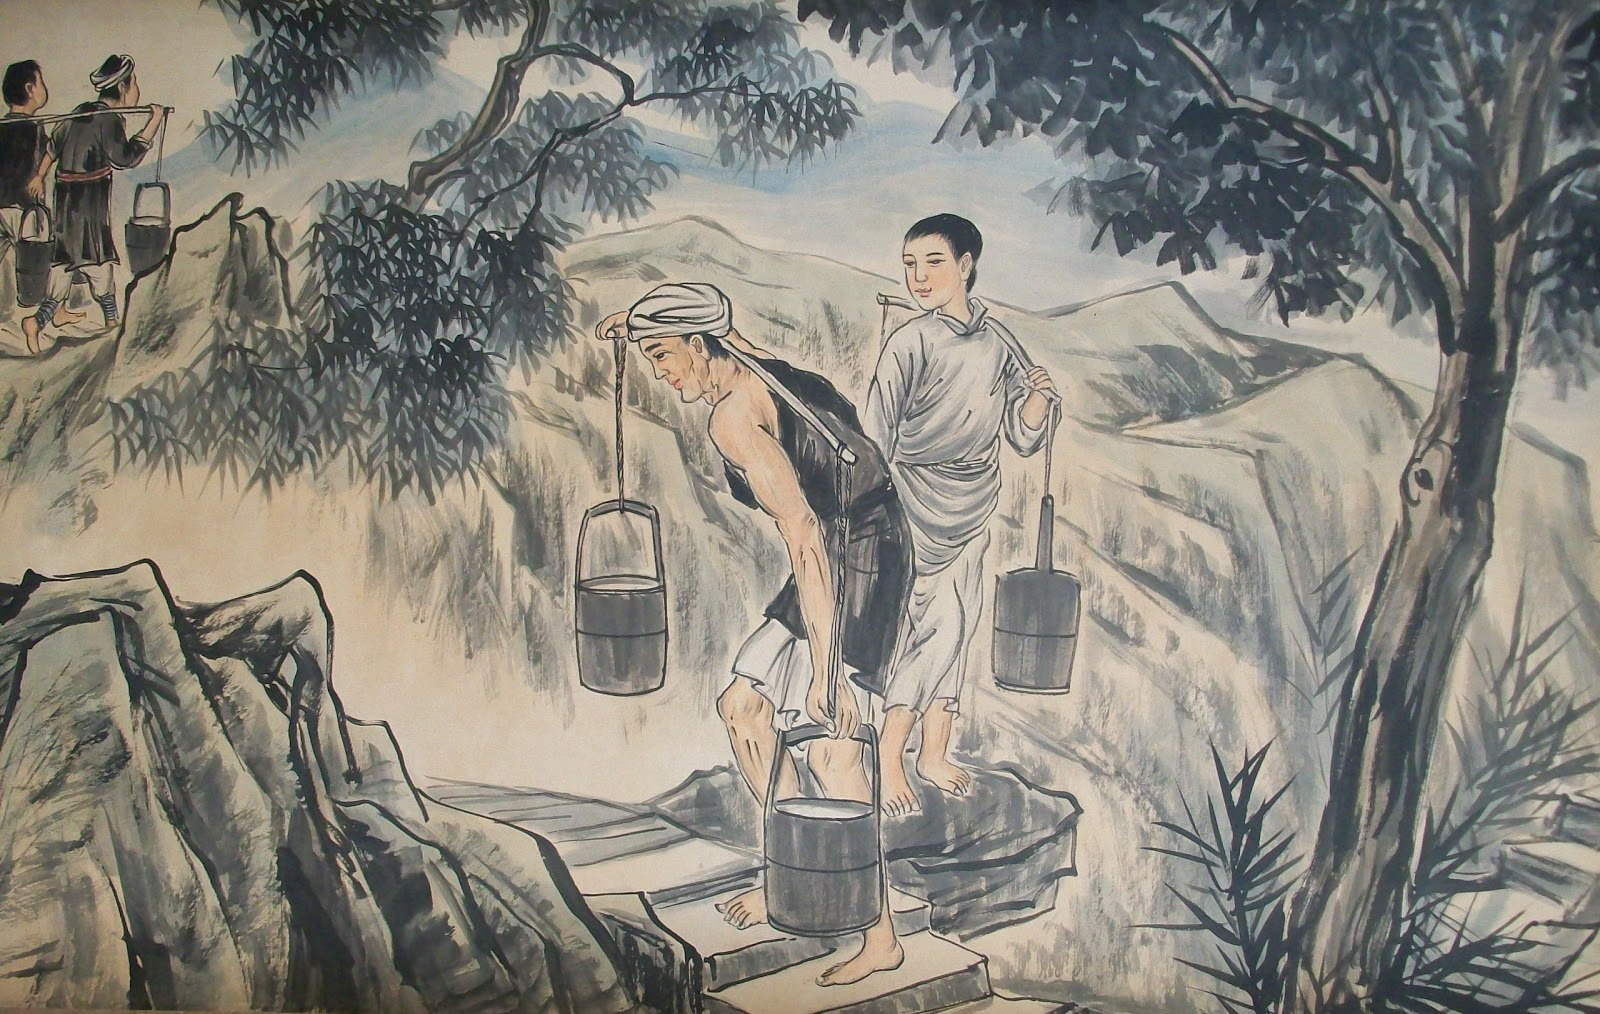 100 Famous People Painting: Orion Hsu & Brothers 徐氏兄弟網路藝術美術博物館 徐氏兄弟网络艺术美术博物馆: The Top